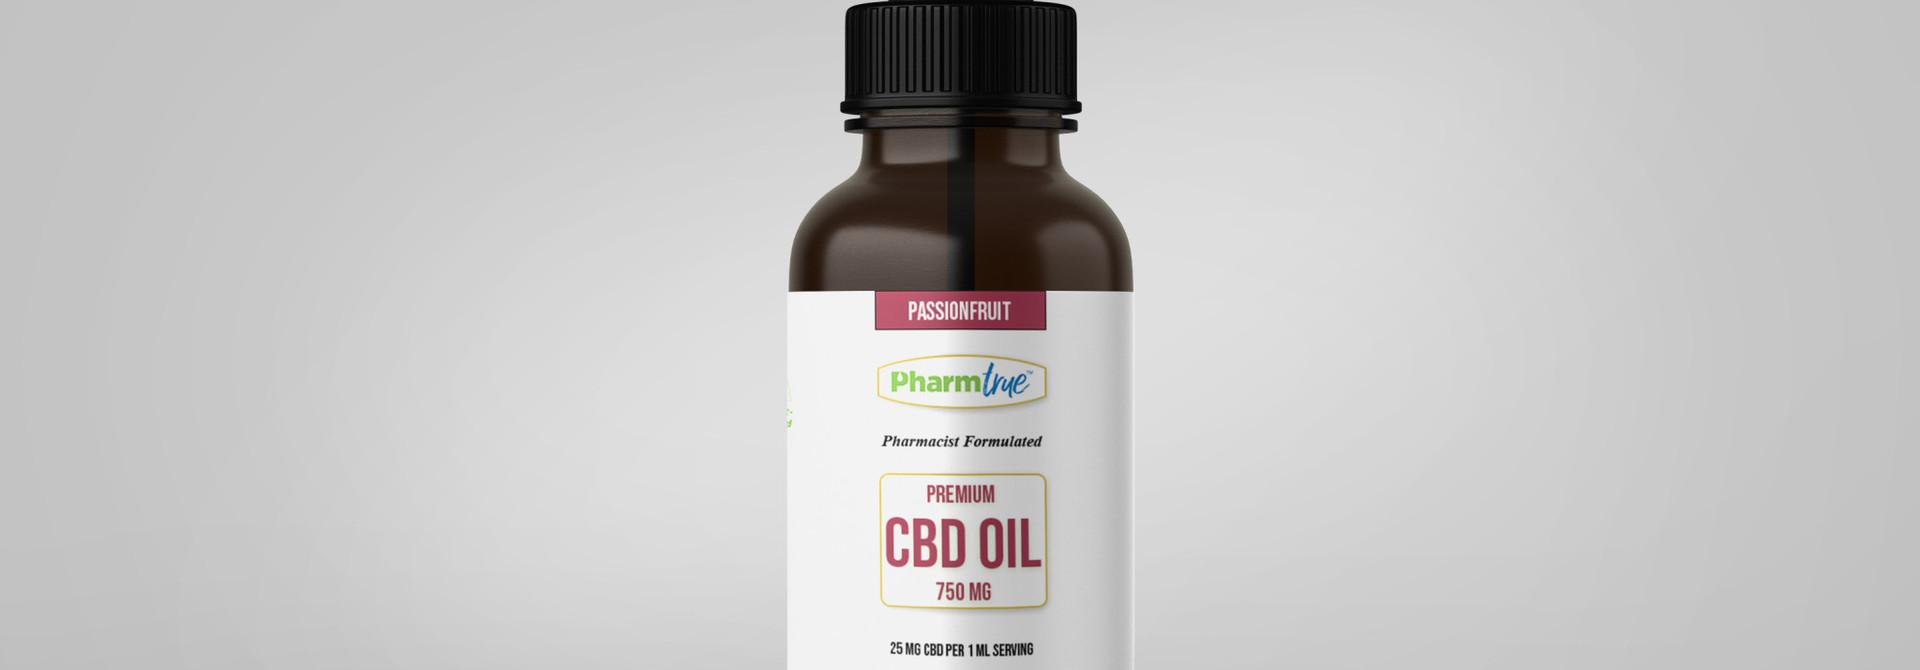 CBD OIL 750 mg TINCTURE - Passionfruit